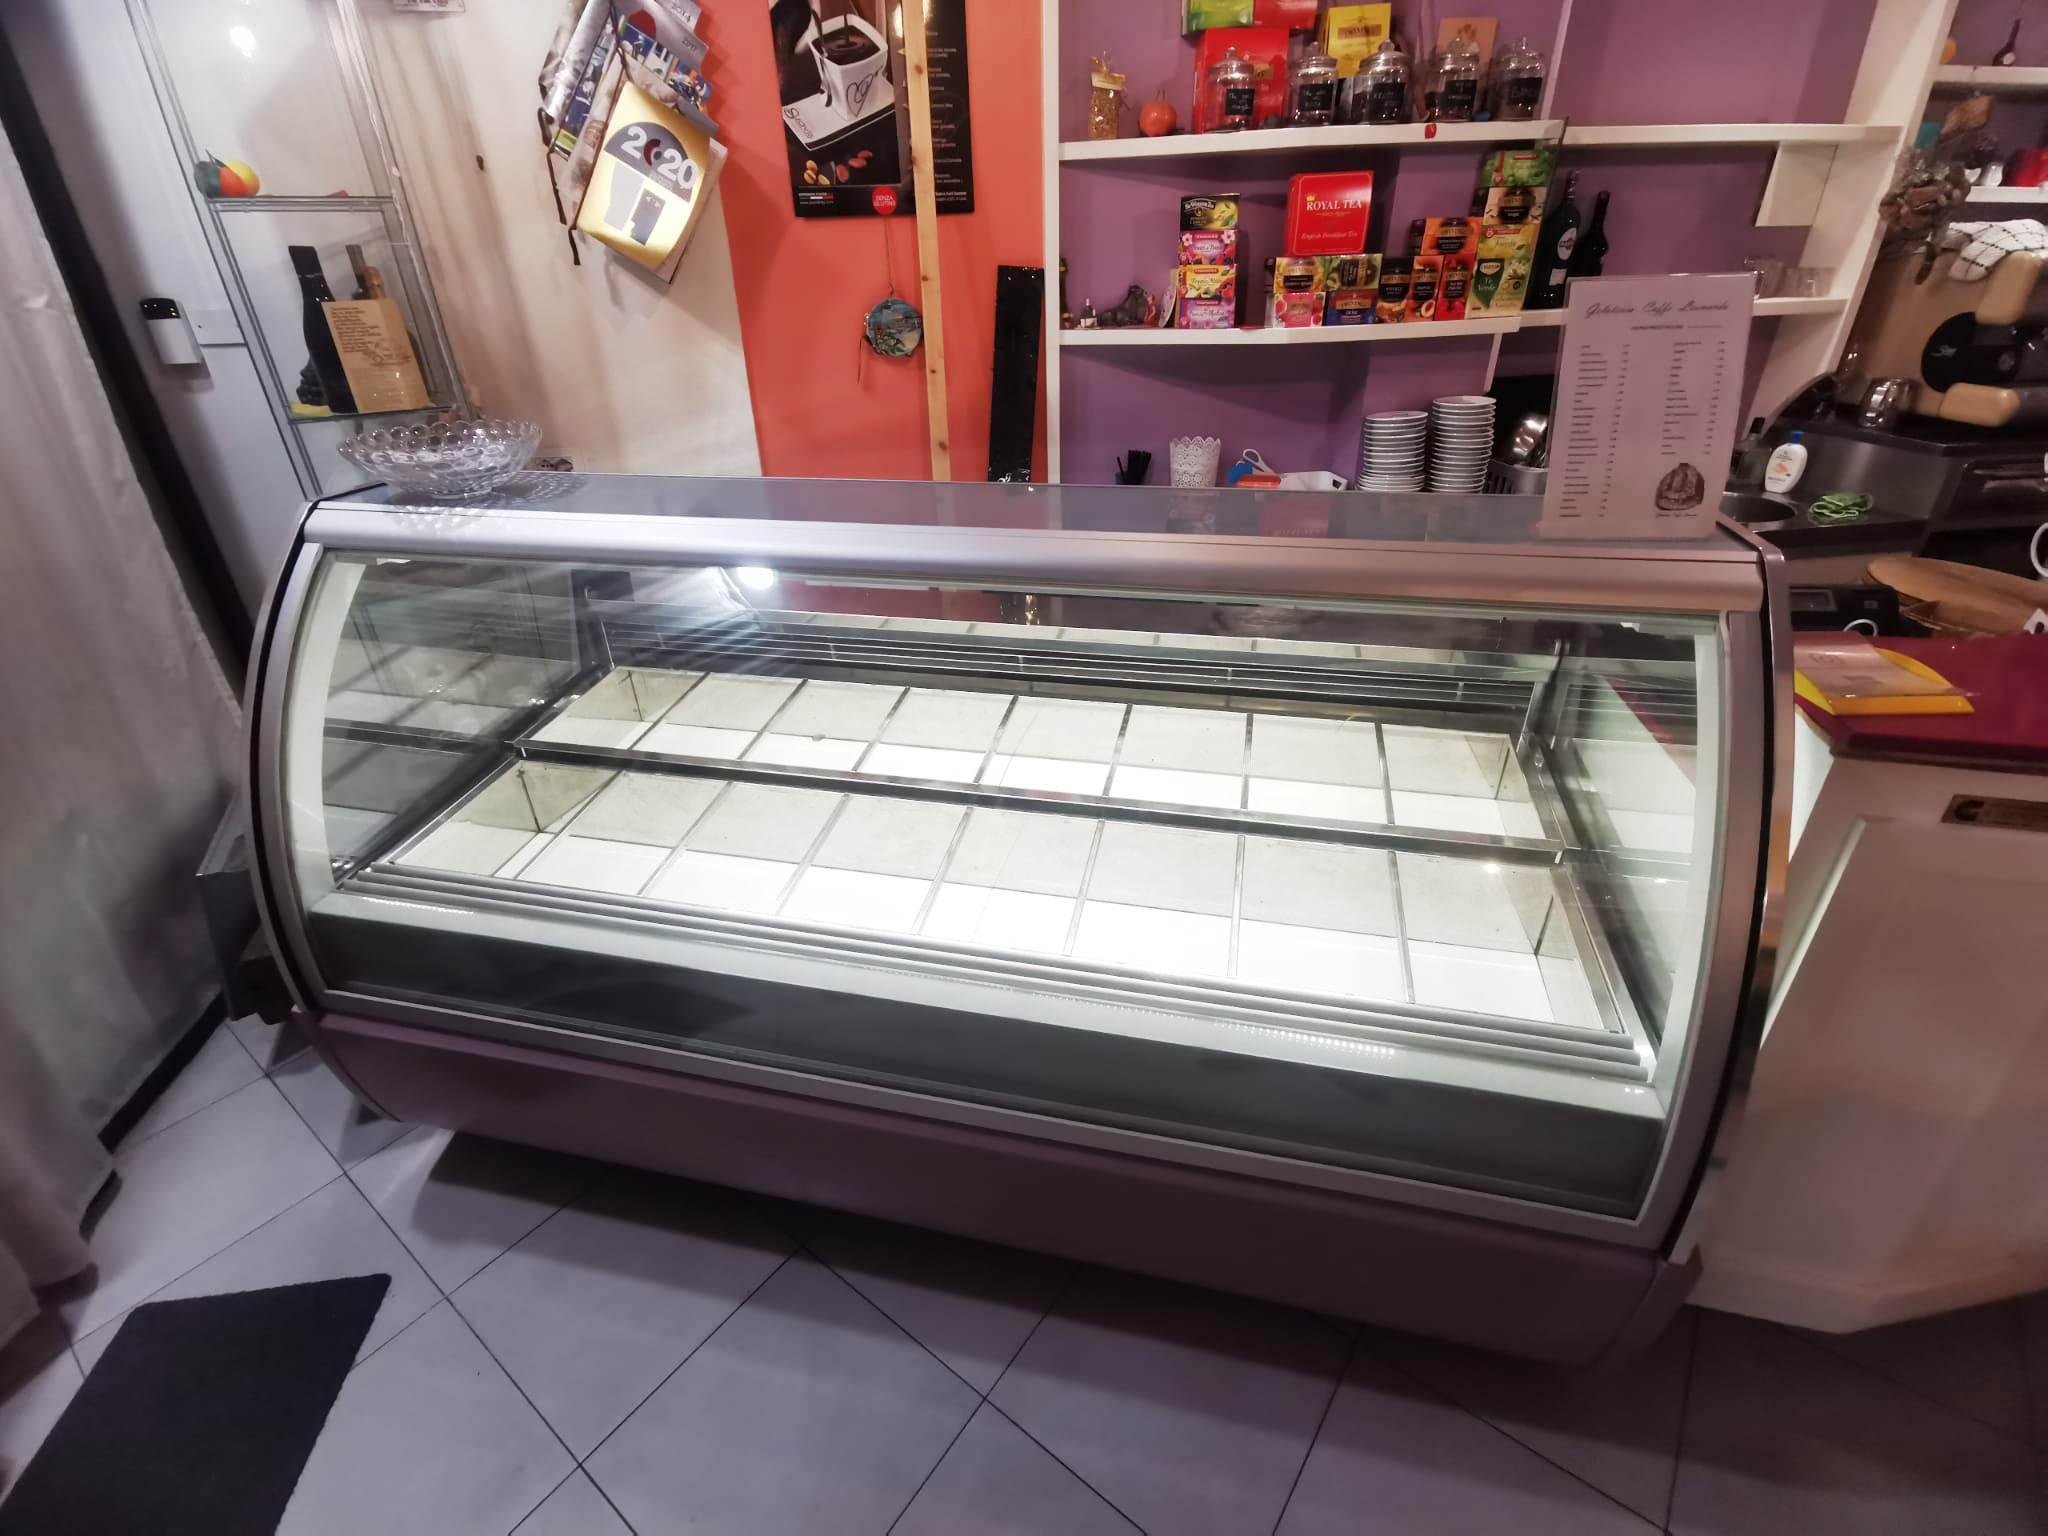 vetrina gelato proxima g12 fb in vendita - foto 2